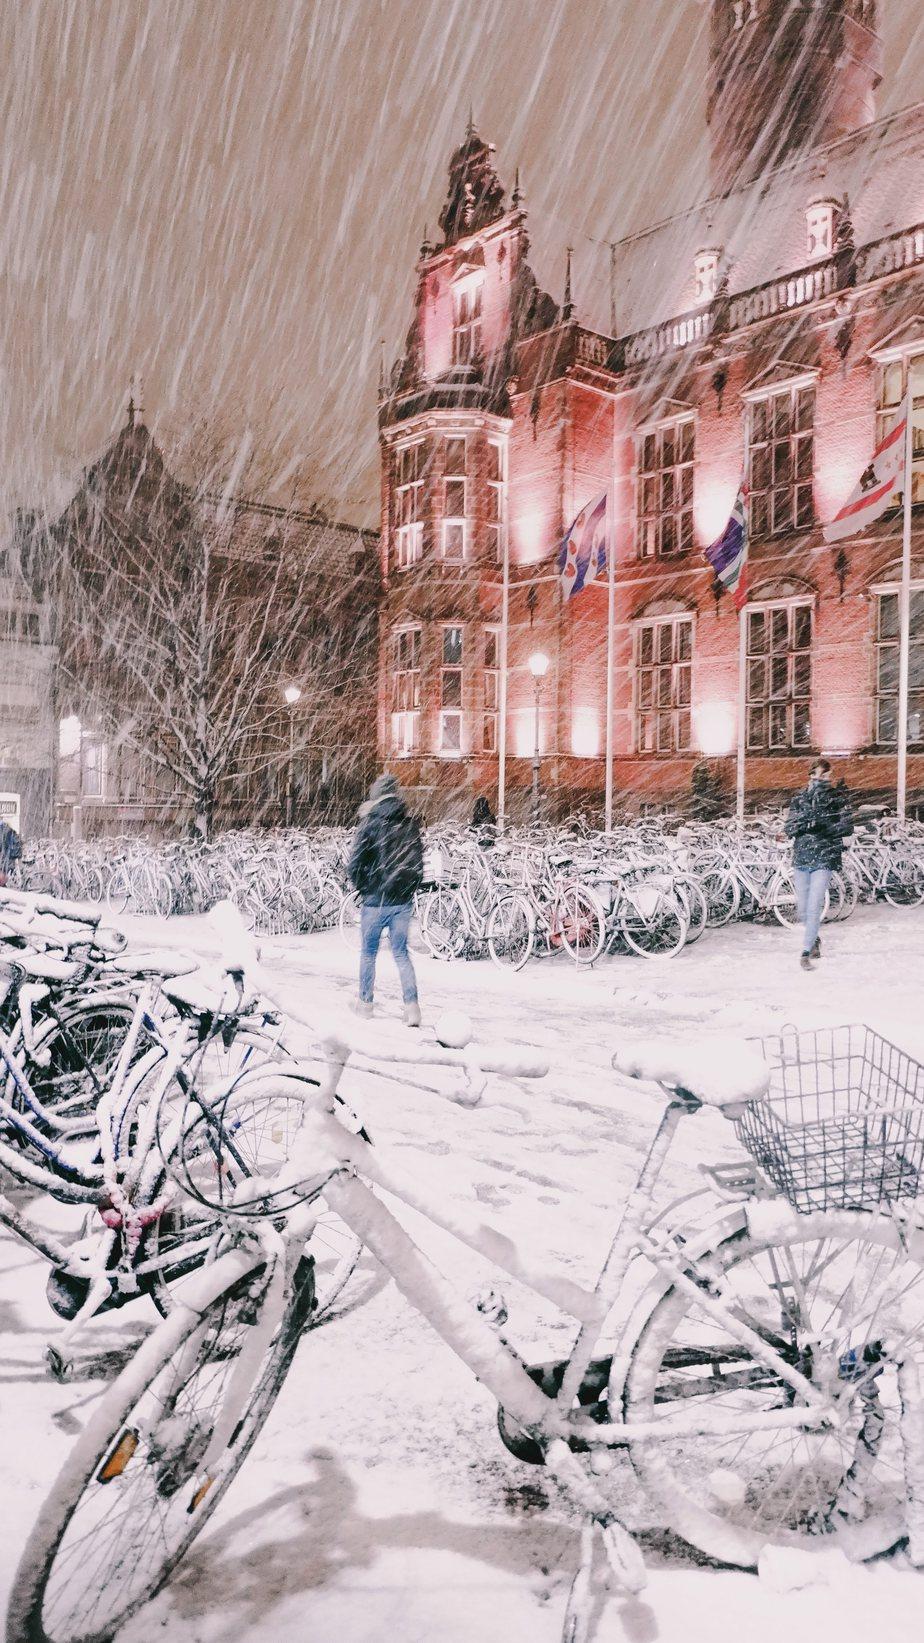 University of Groningen covered in snow